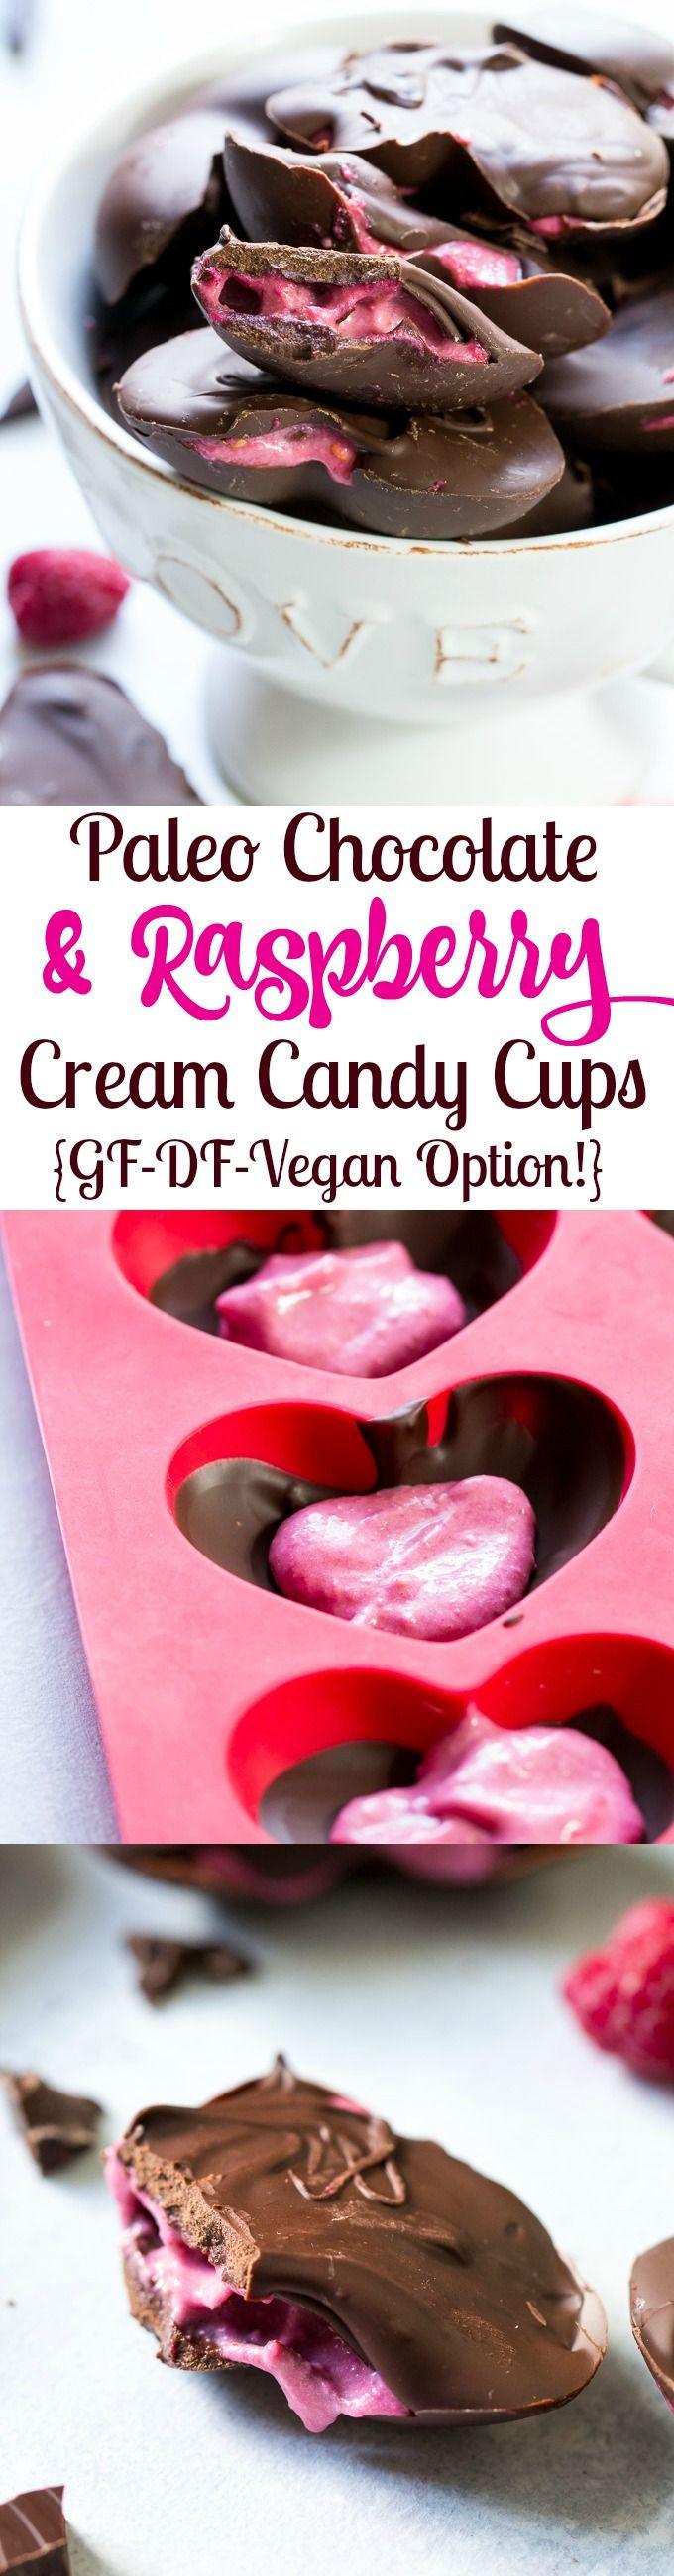 Chocolate Raspberry Cream Paleo Candy Cups {Vegan Option}   The Paleo Running Momma